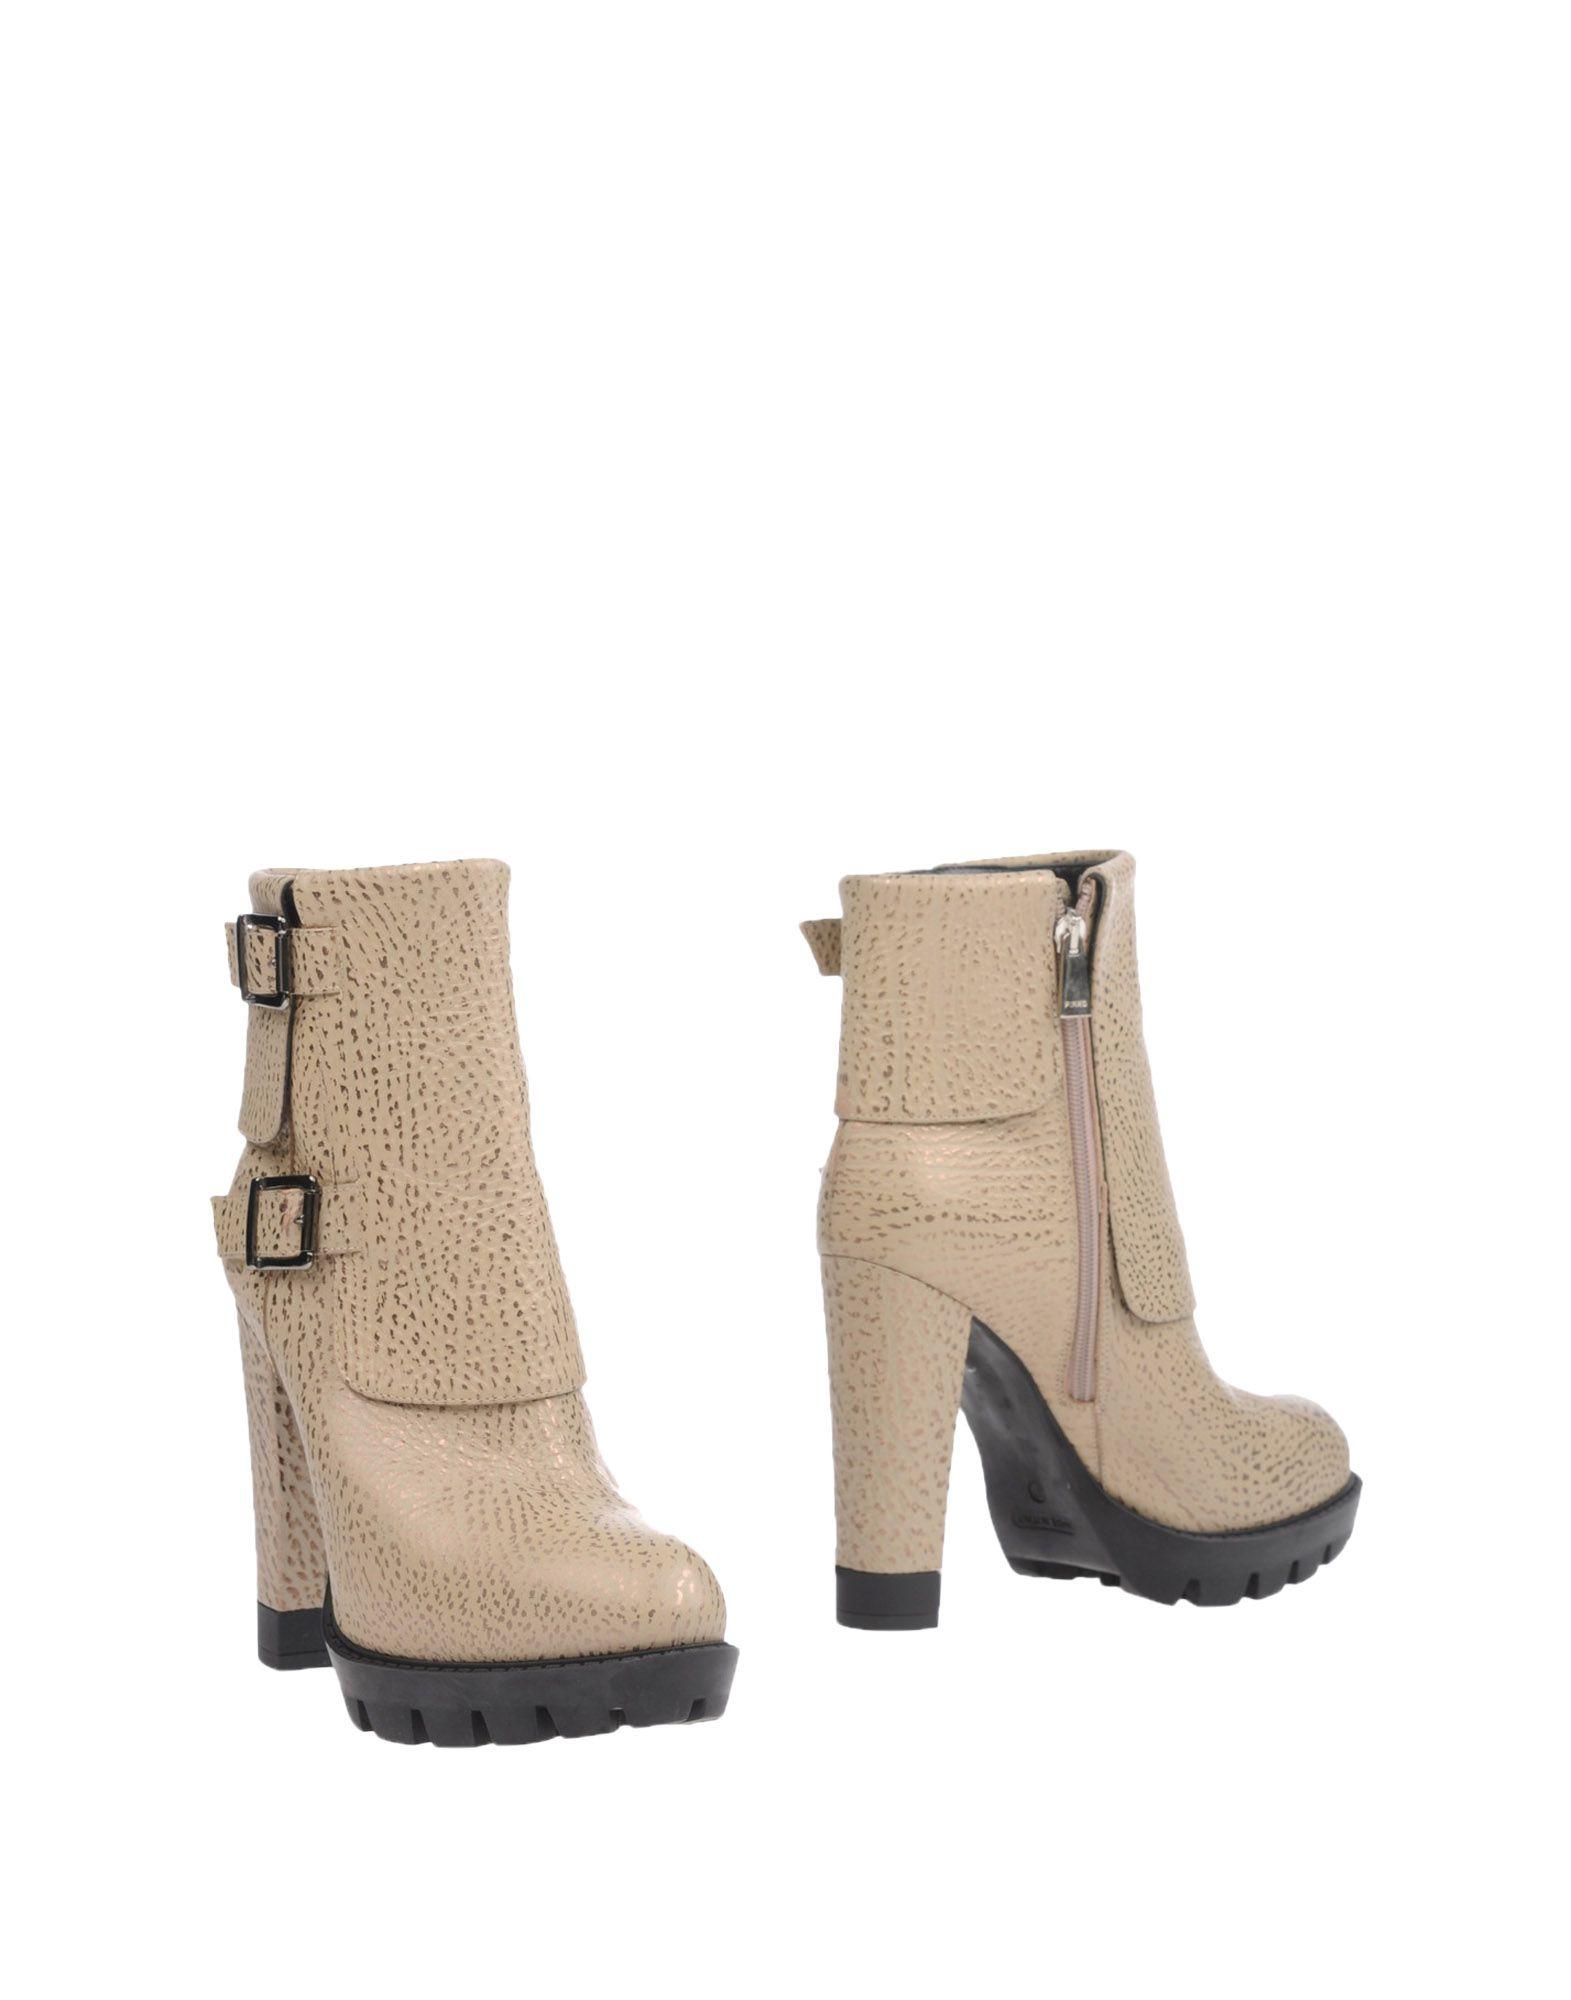 Pinko Ankle Boot - Women Pinko Ankle Boots online 11231090KP on  Australia - 11231090KP online 2b20c7